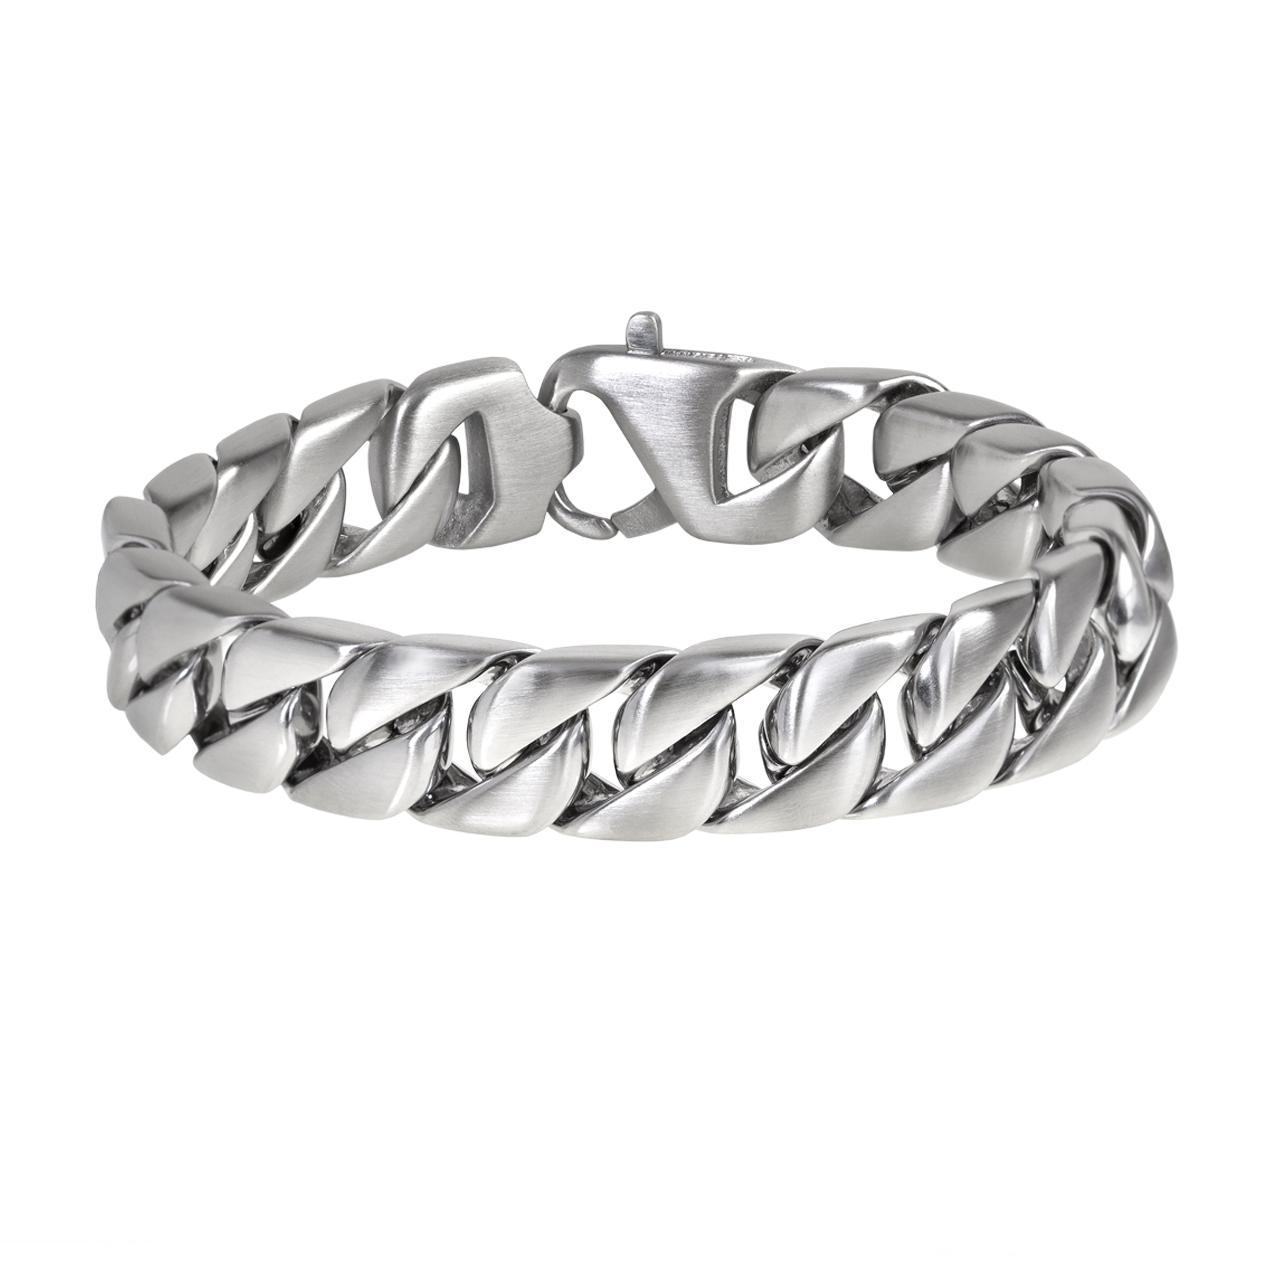 دستبند مردانه اقلیمه کد DS420